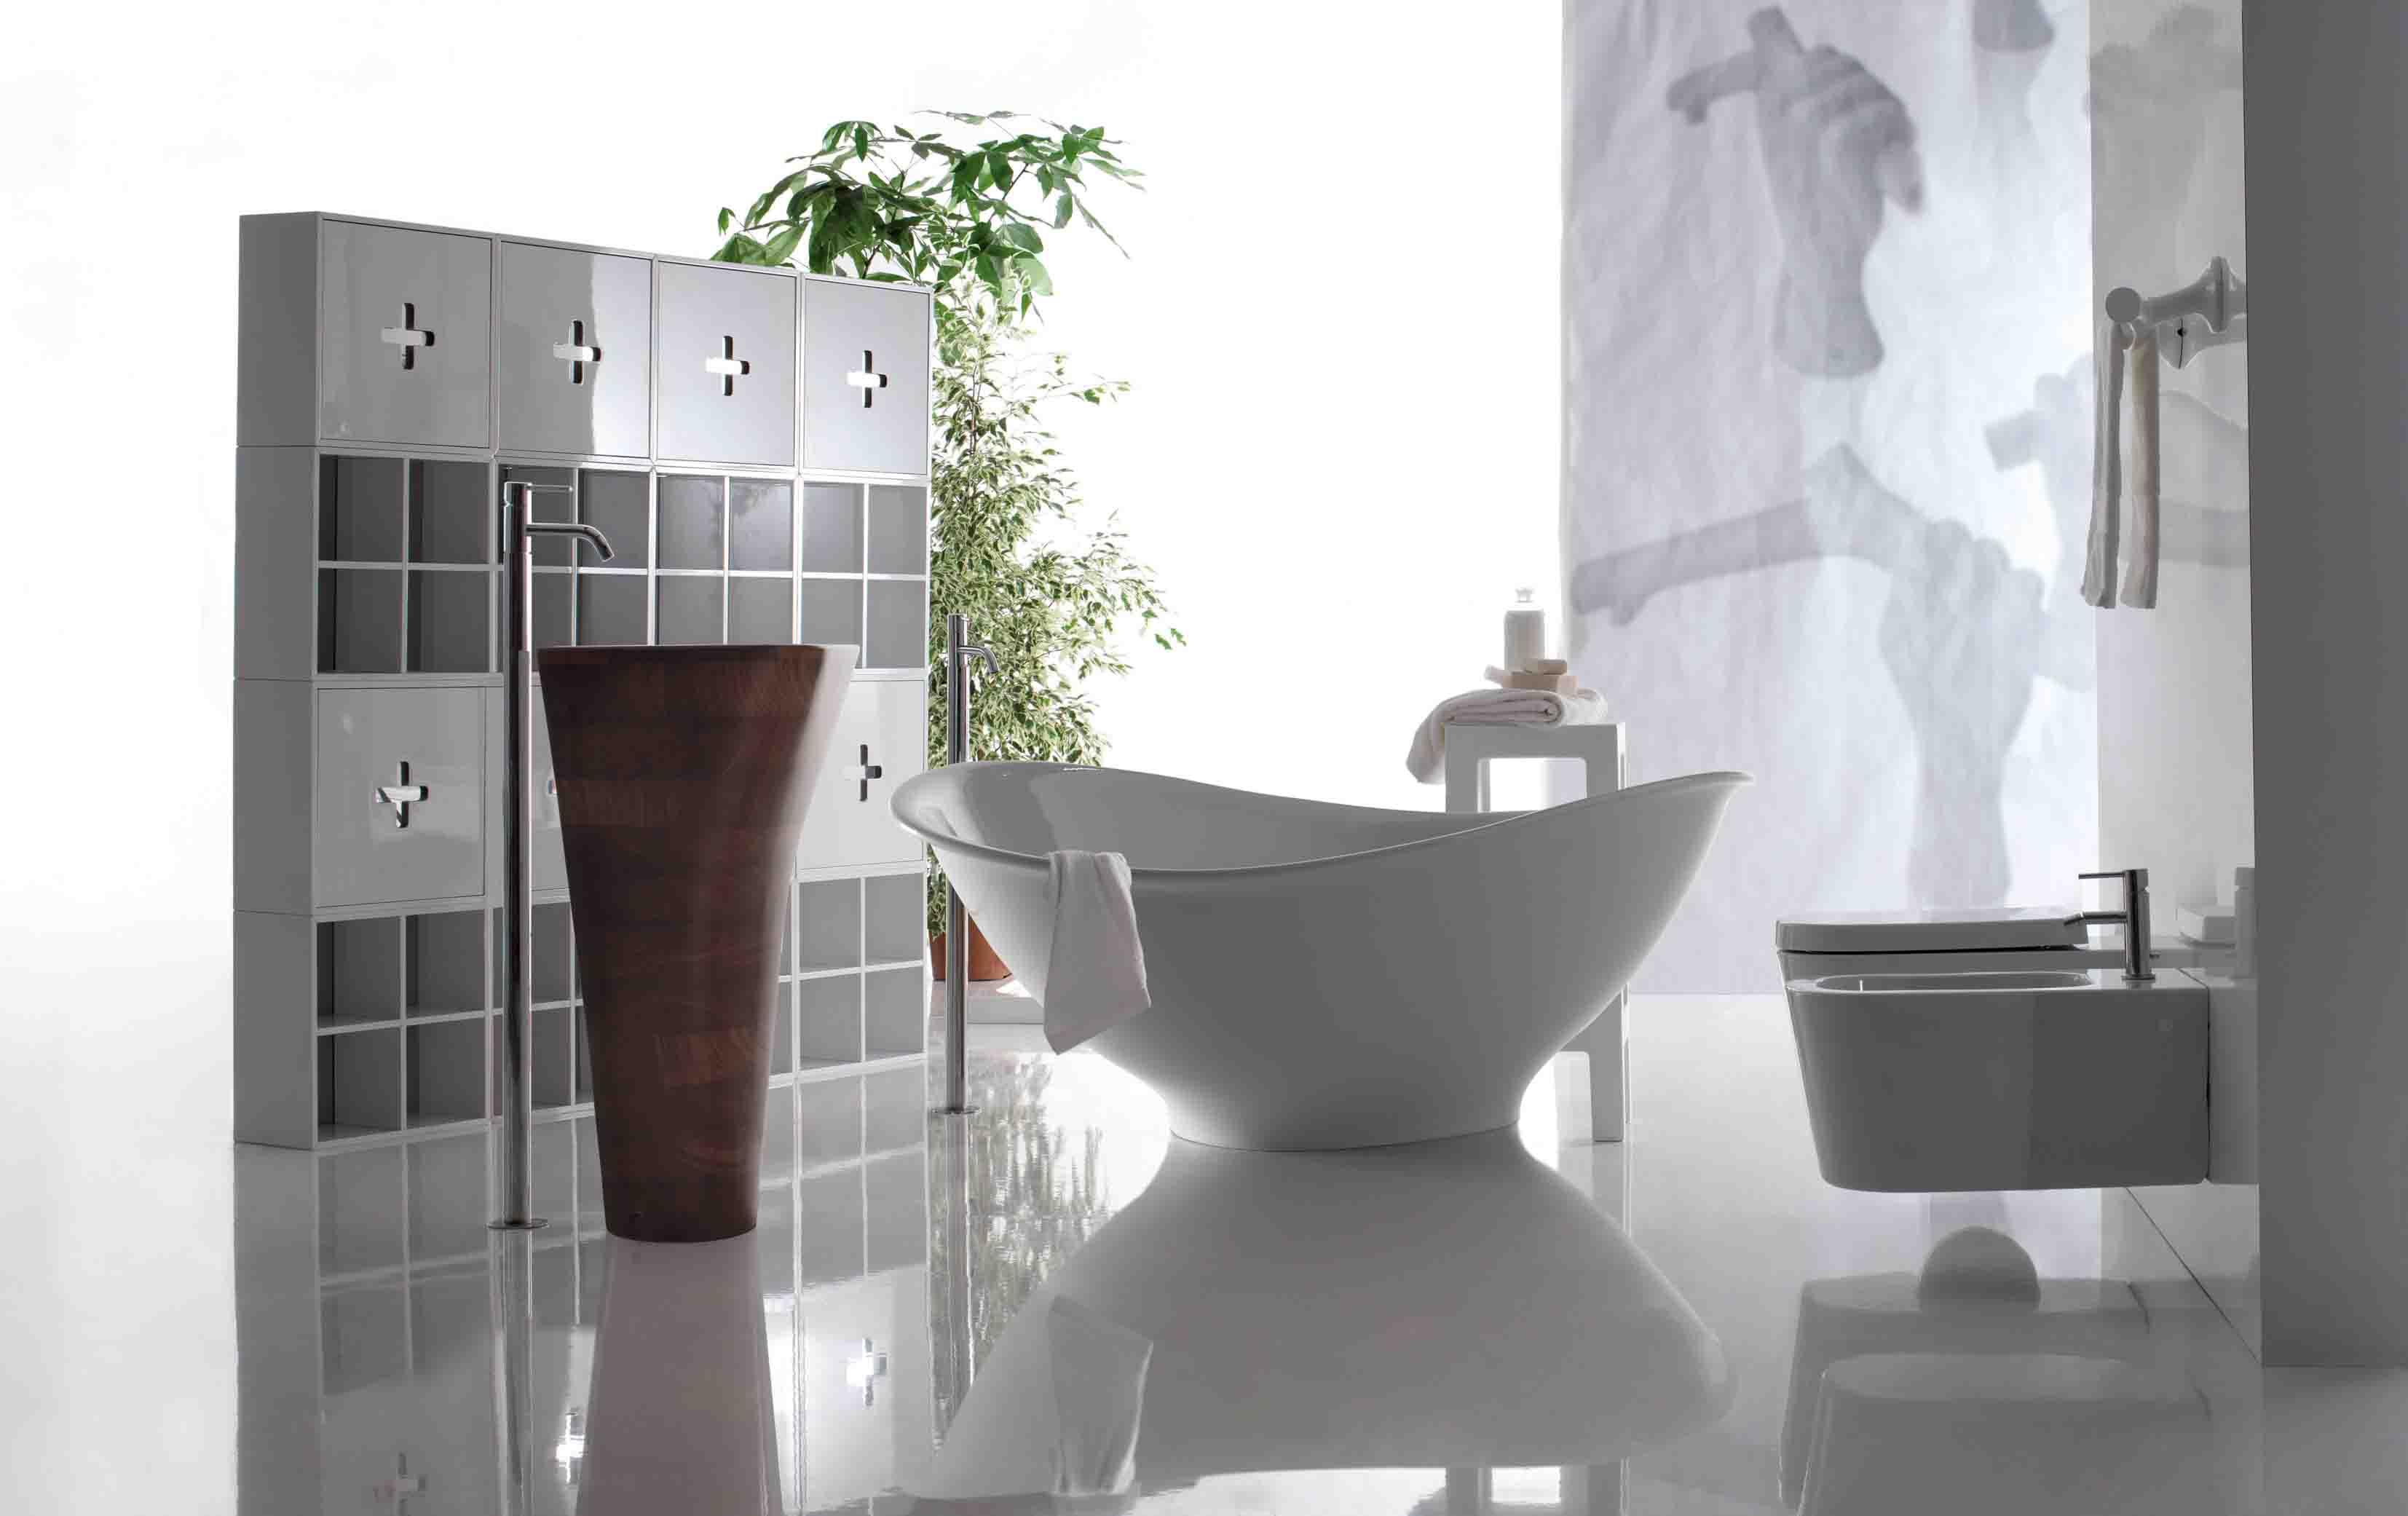 Meg 11 la vasca eco di ceramica galassia bagno italiano blog - Vasca da bagno ceramica ...